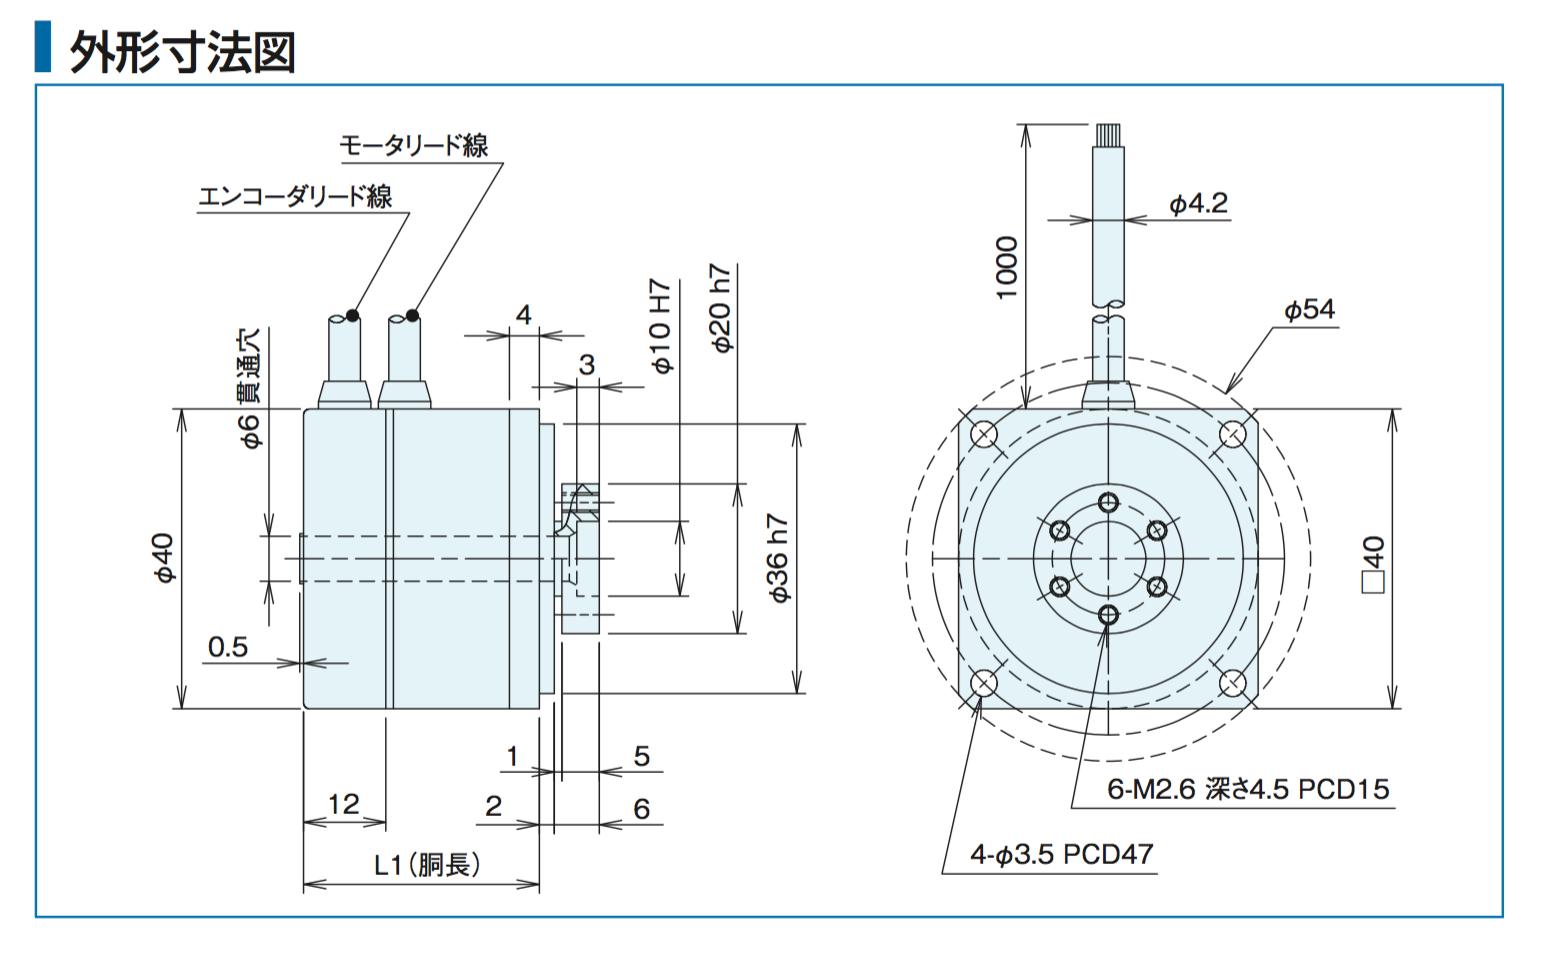 MDH-20外形寸法図